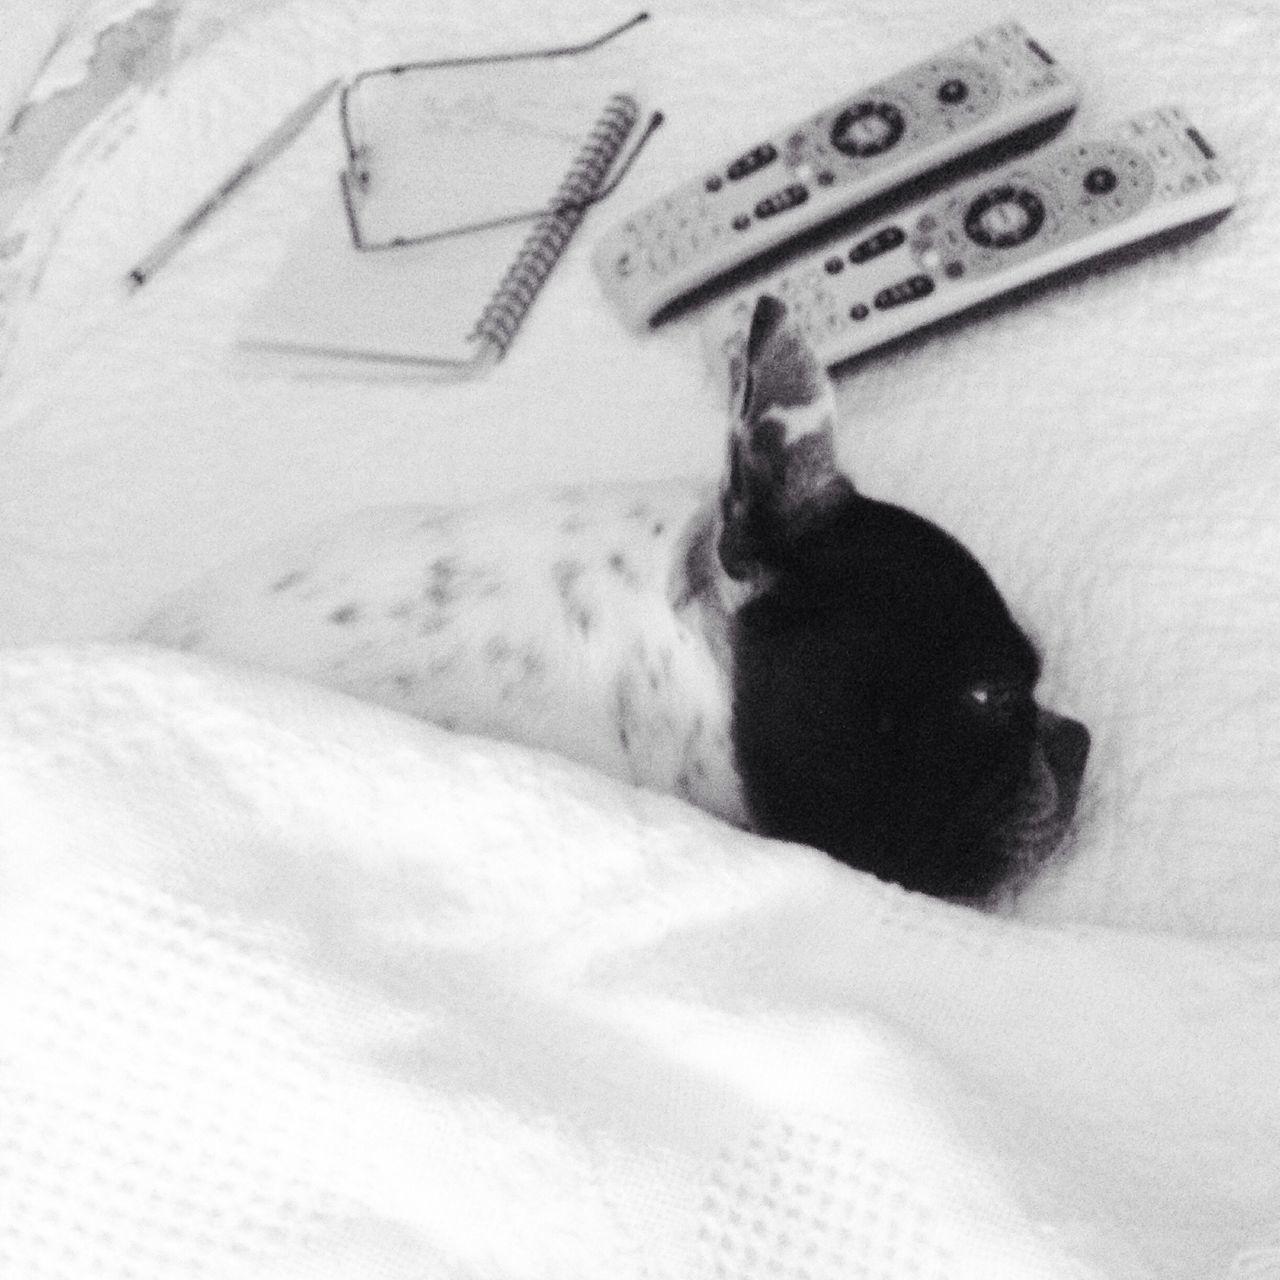 Boston Terrier Dog Perro Sleep Dormir